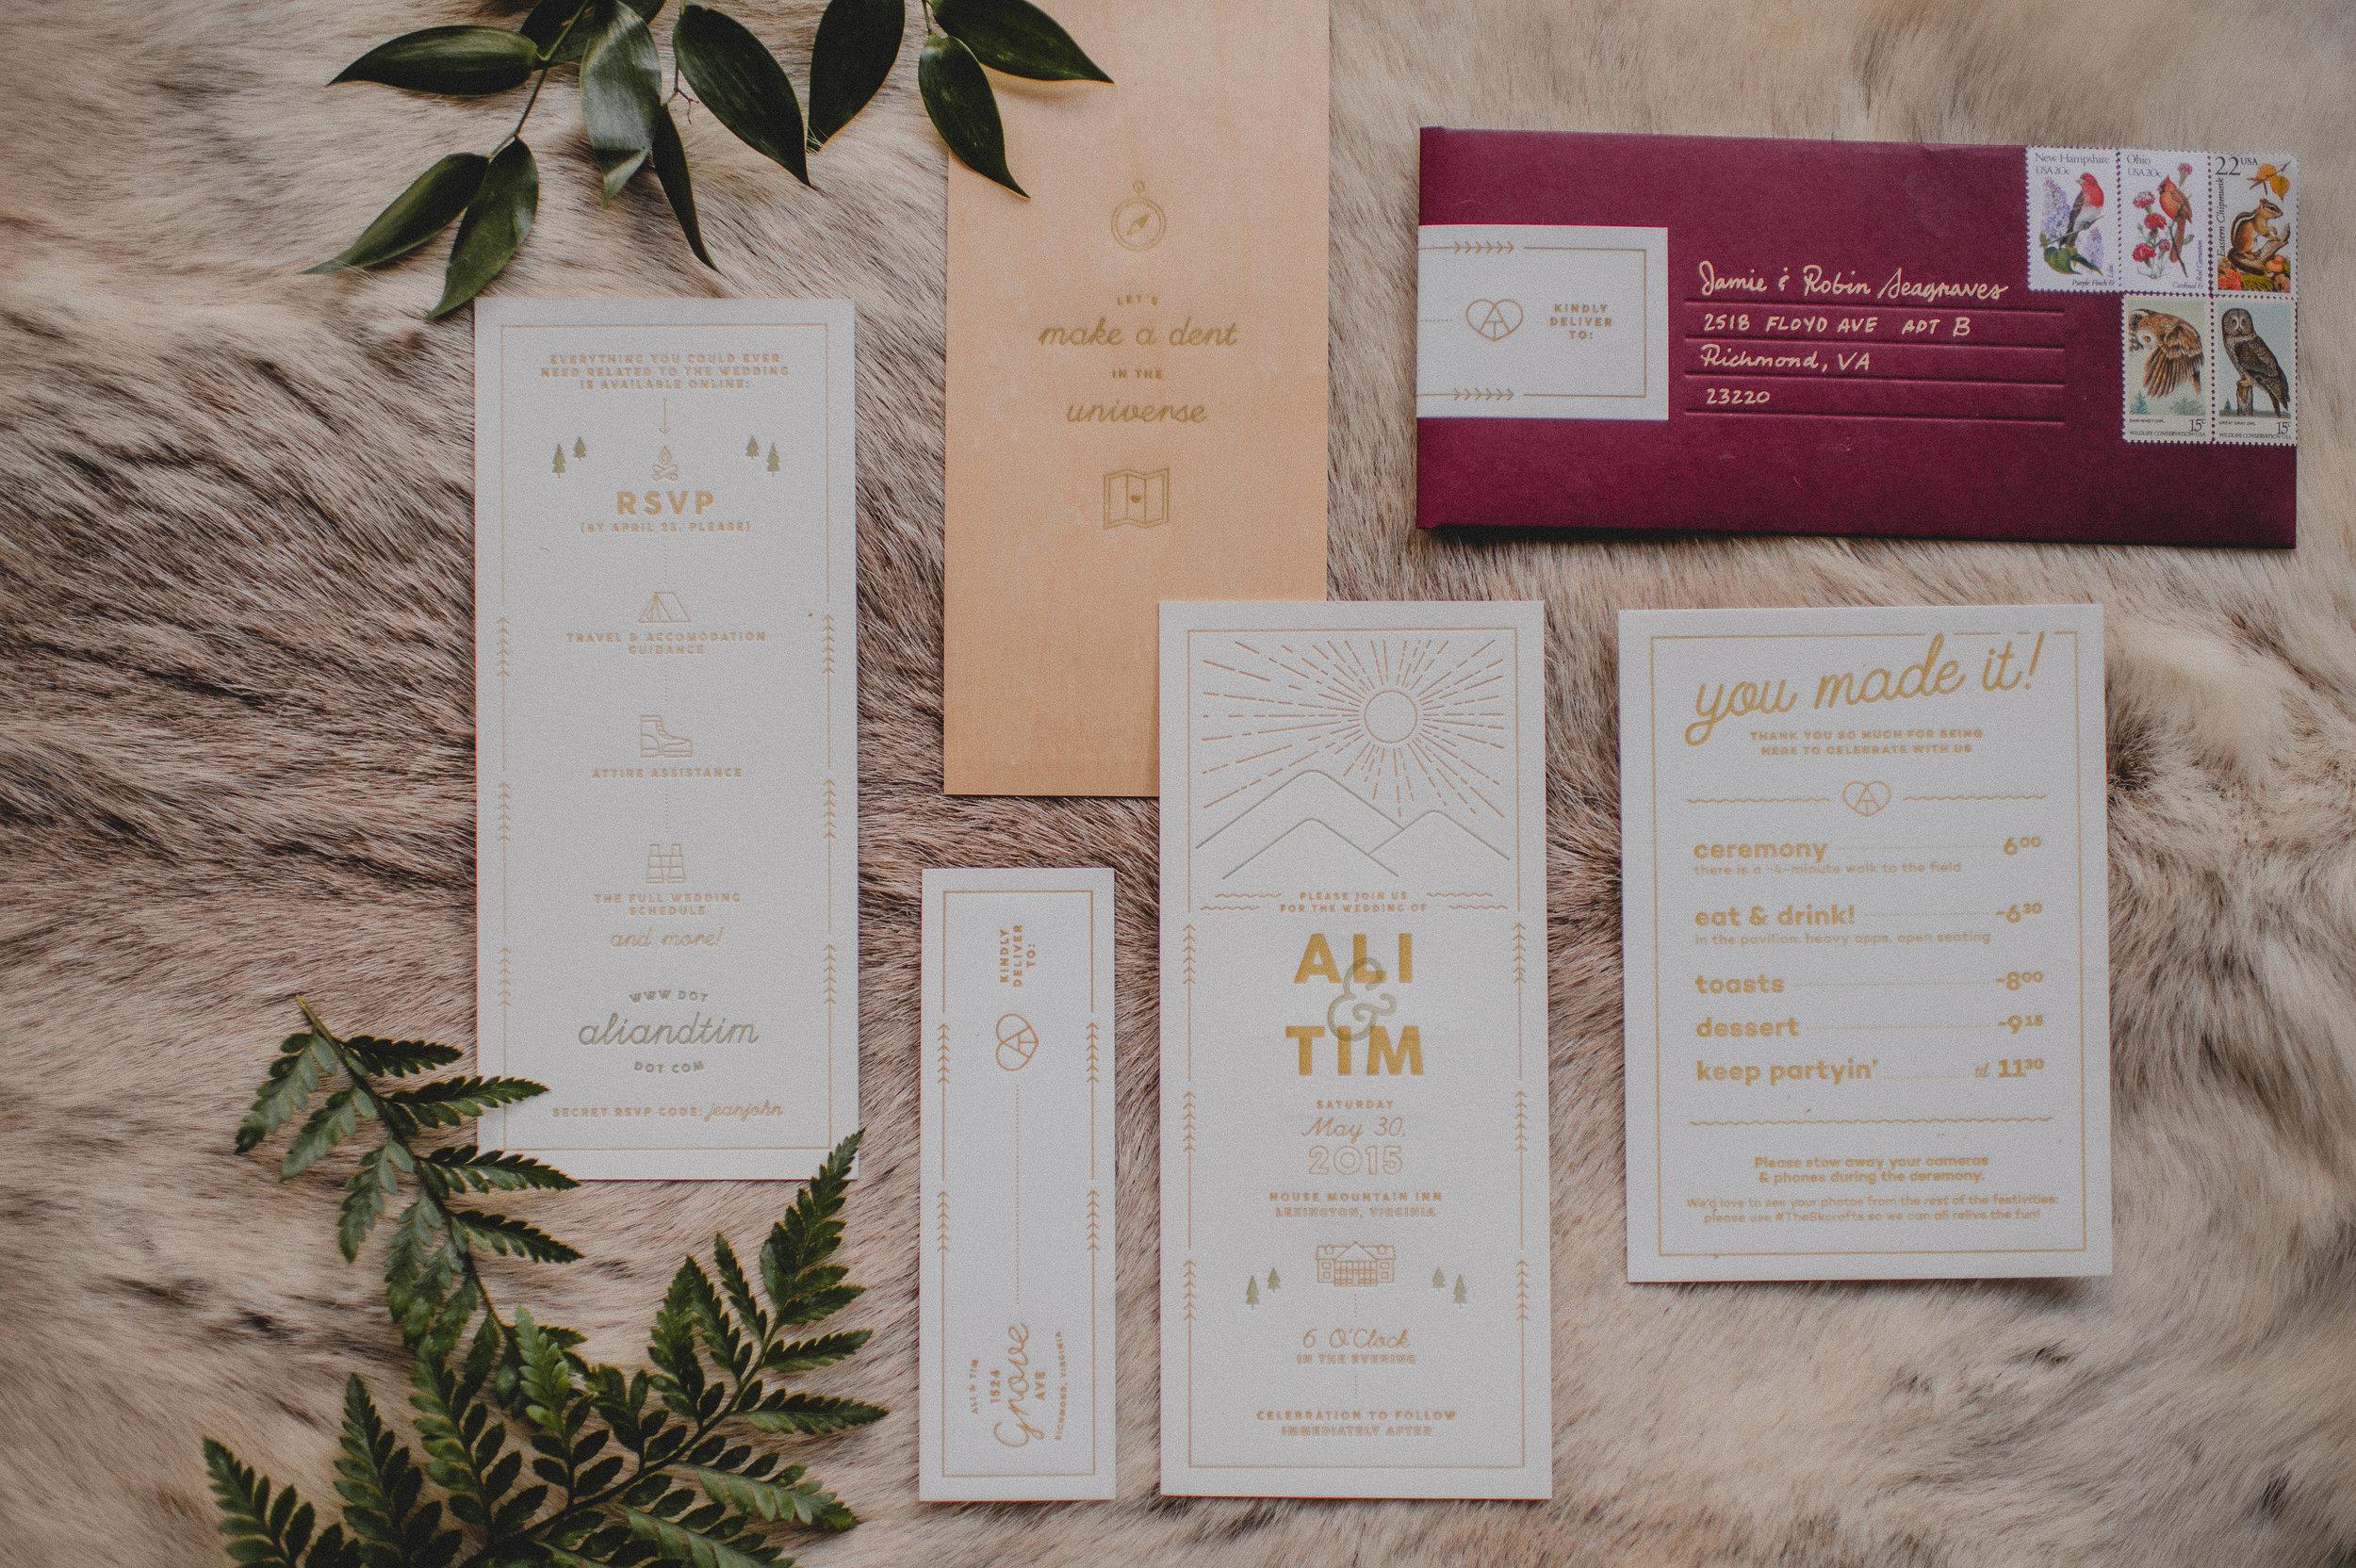 Skirven & croft invitations